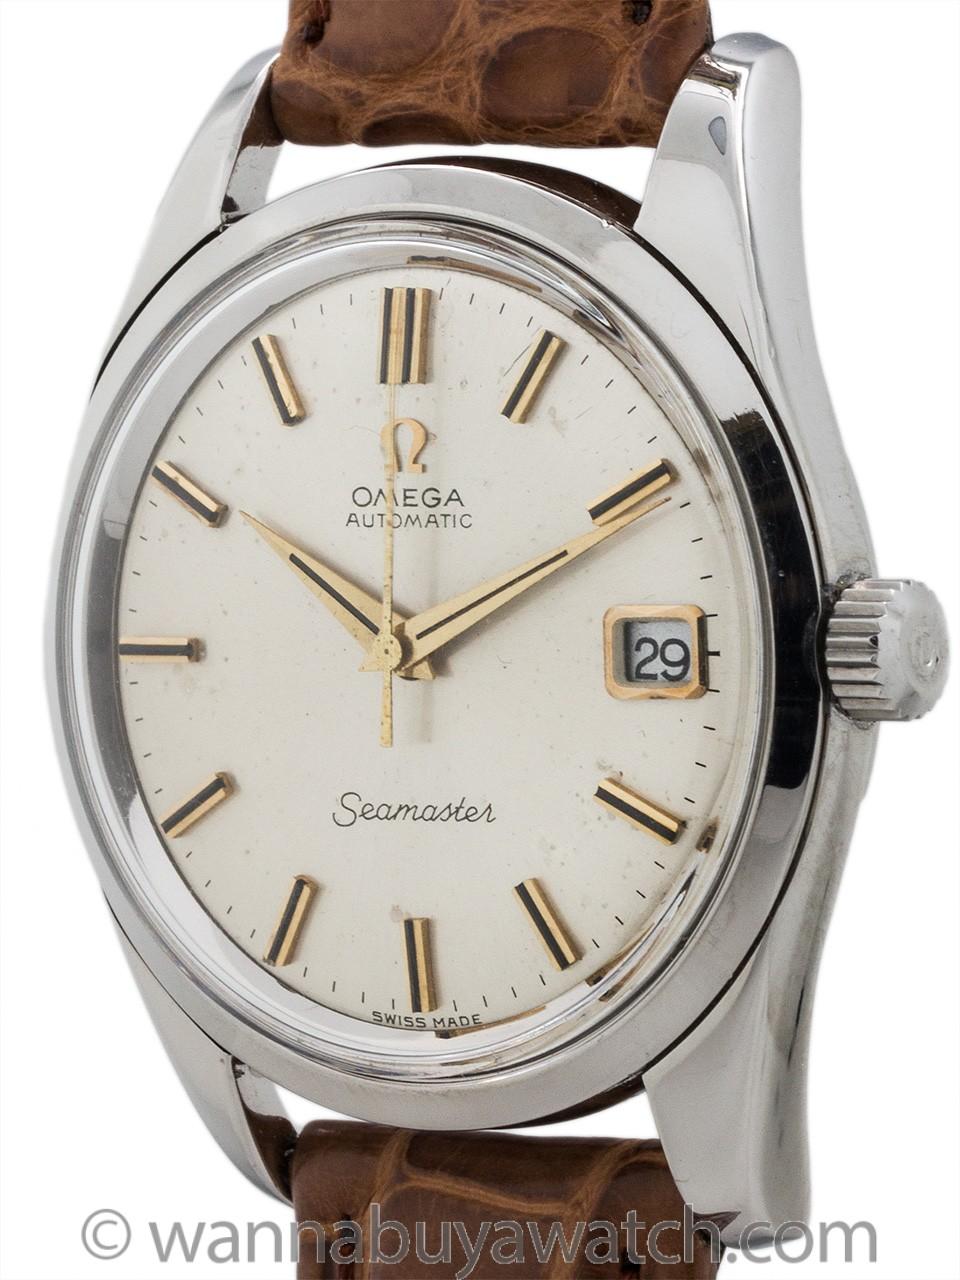 Omega Seamaster Automatic ref 166.010 circa 1965